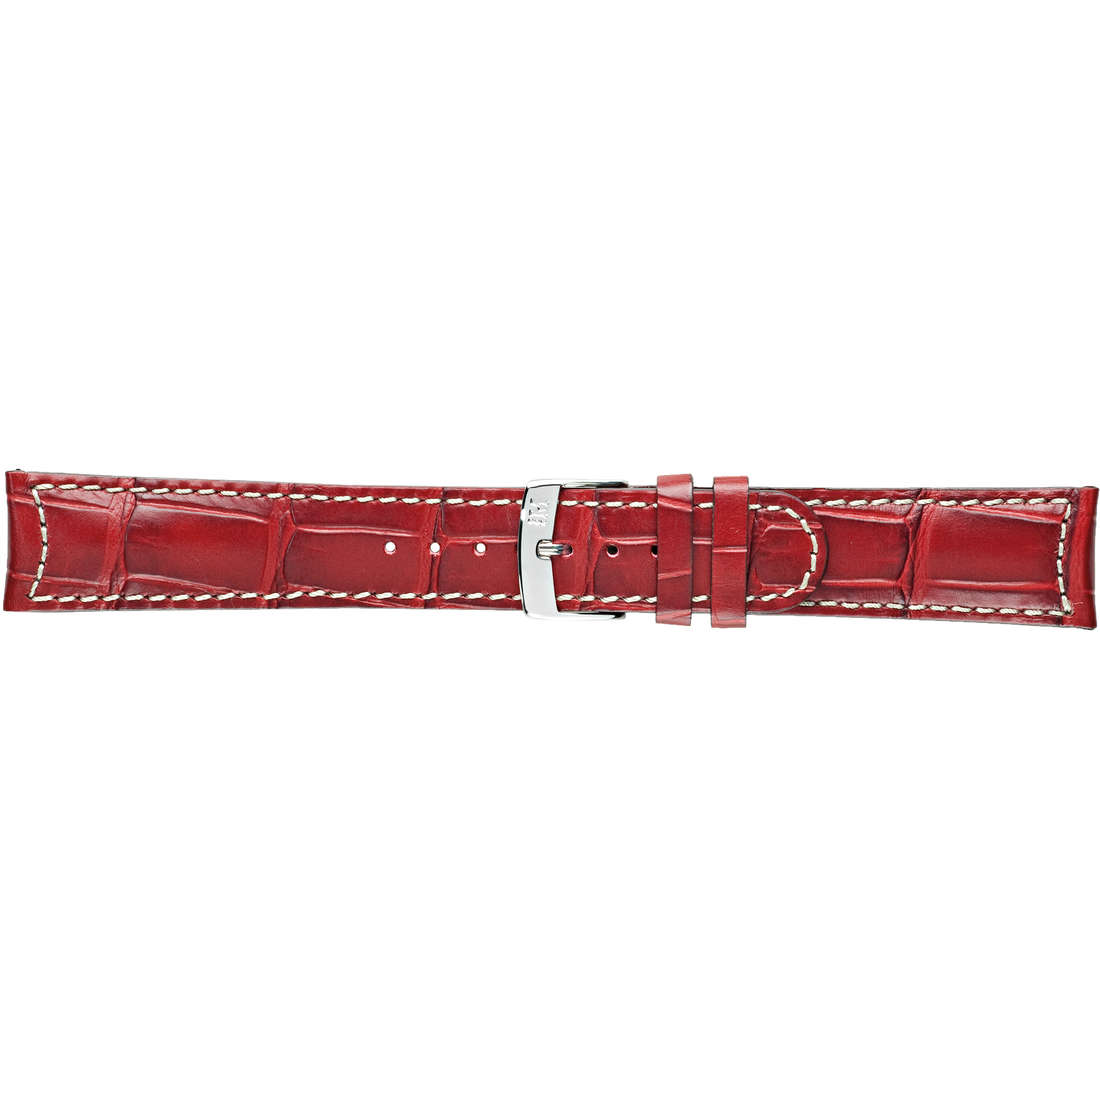 watch watch bands watch straps man Morellato Manufatti A01U3882A59080CR22